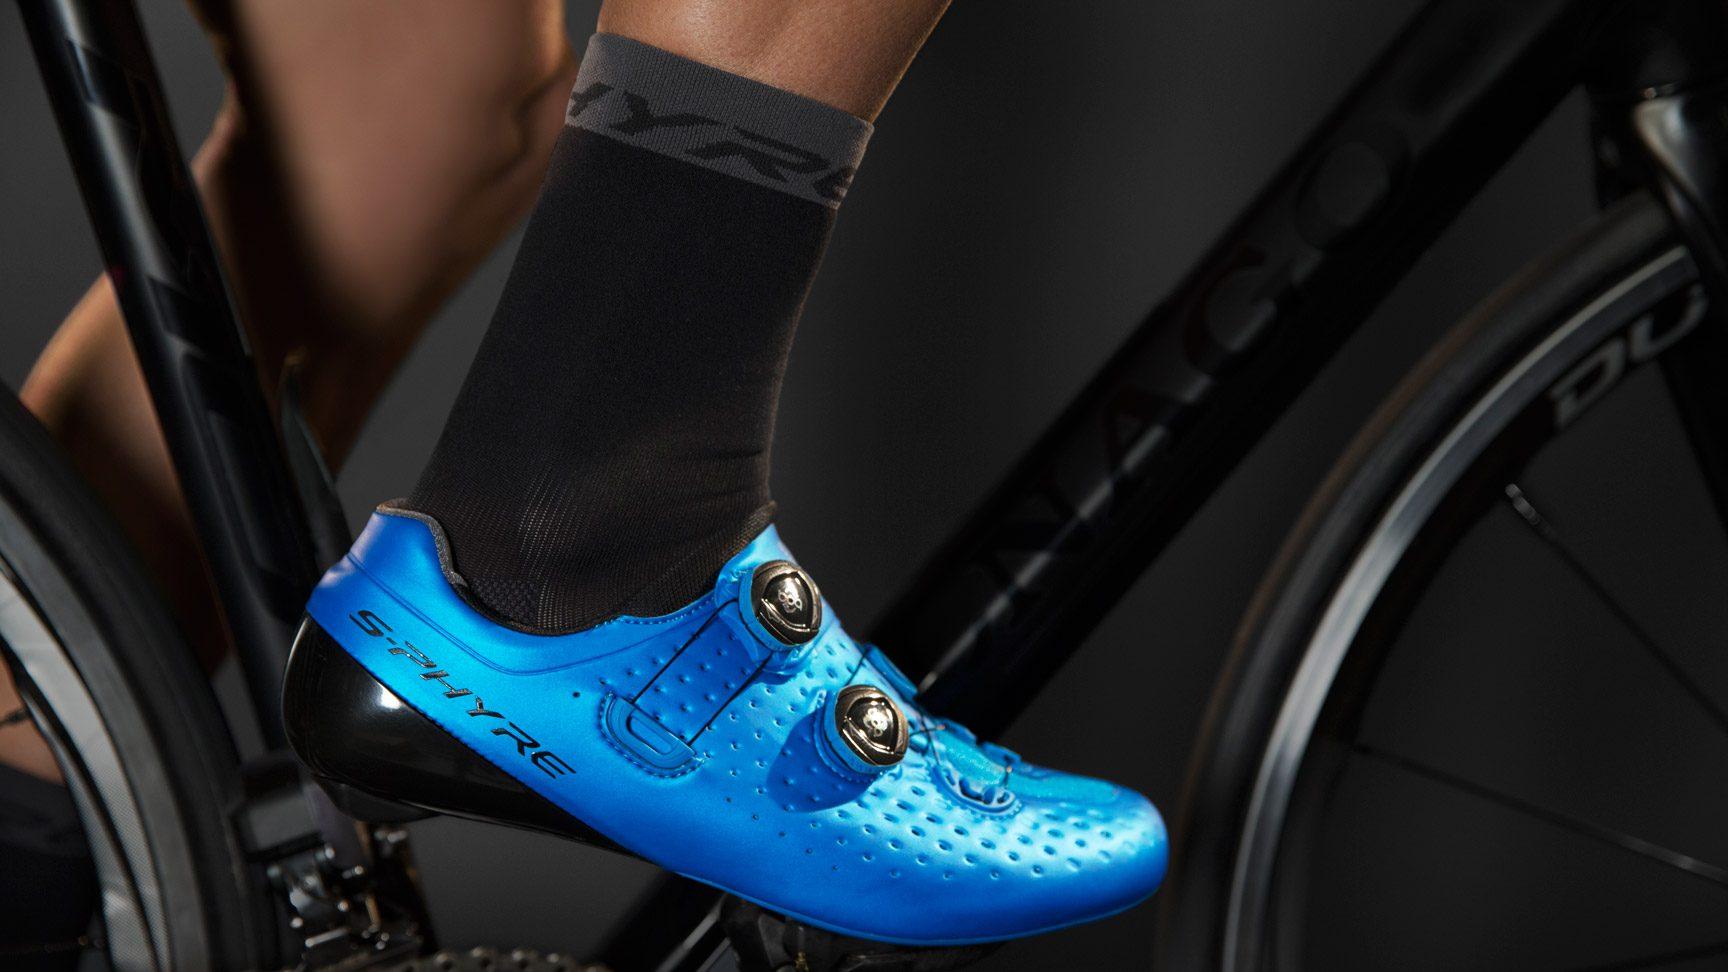 S-phyre High Socks Blue Shimano Bike